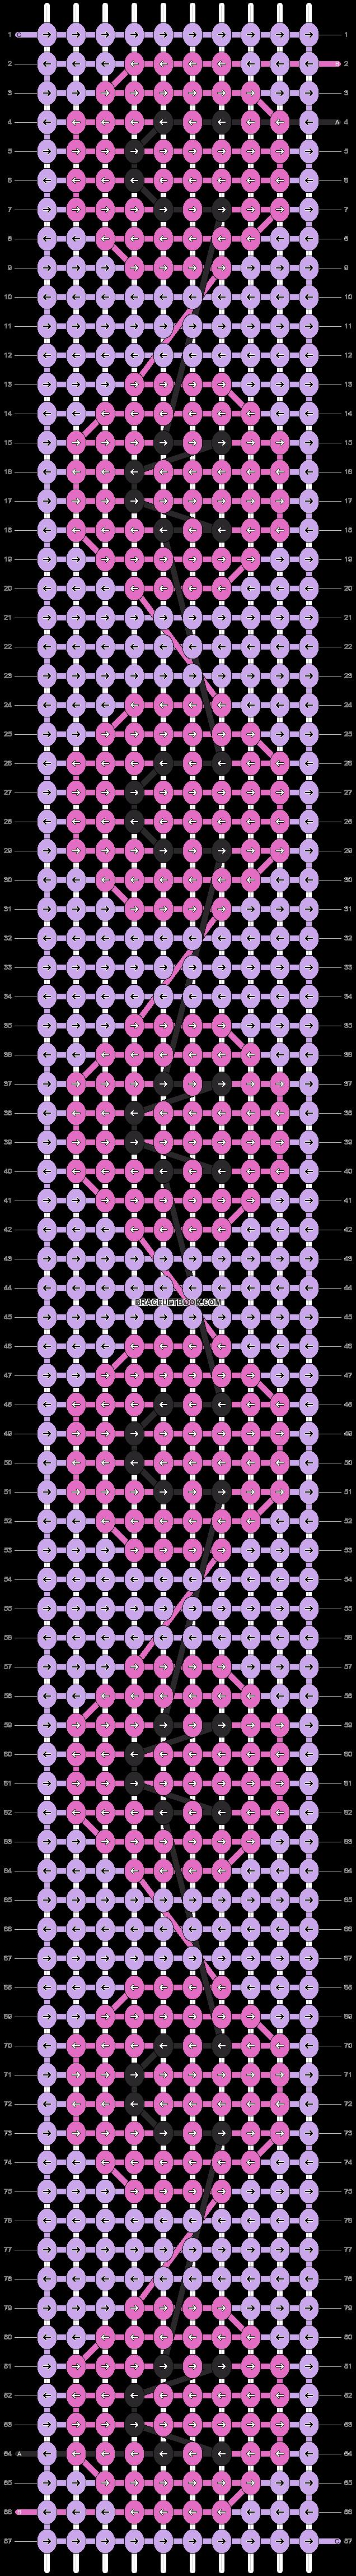 Alpha pattern #86446 variation #156426 pattern